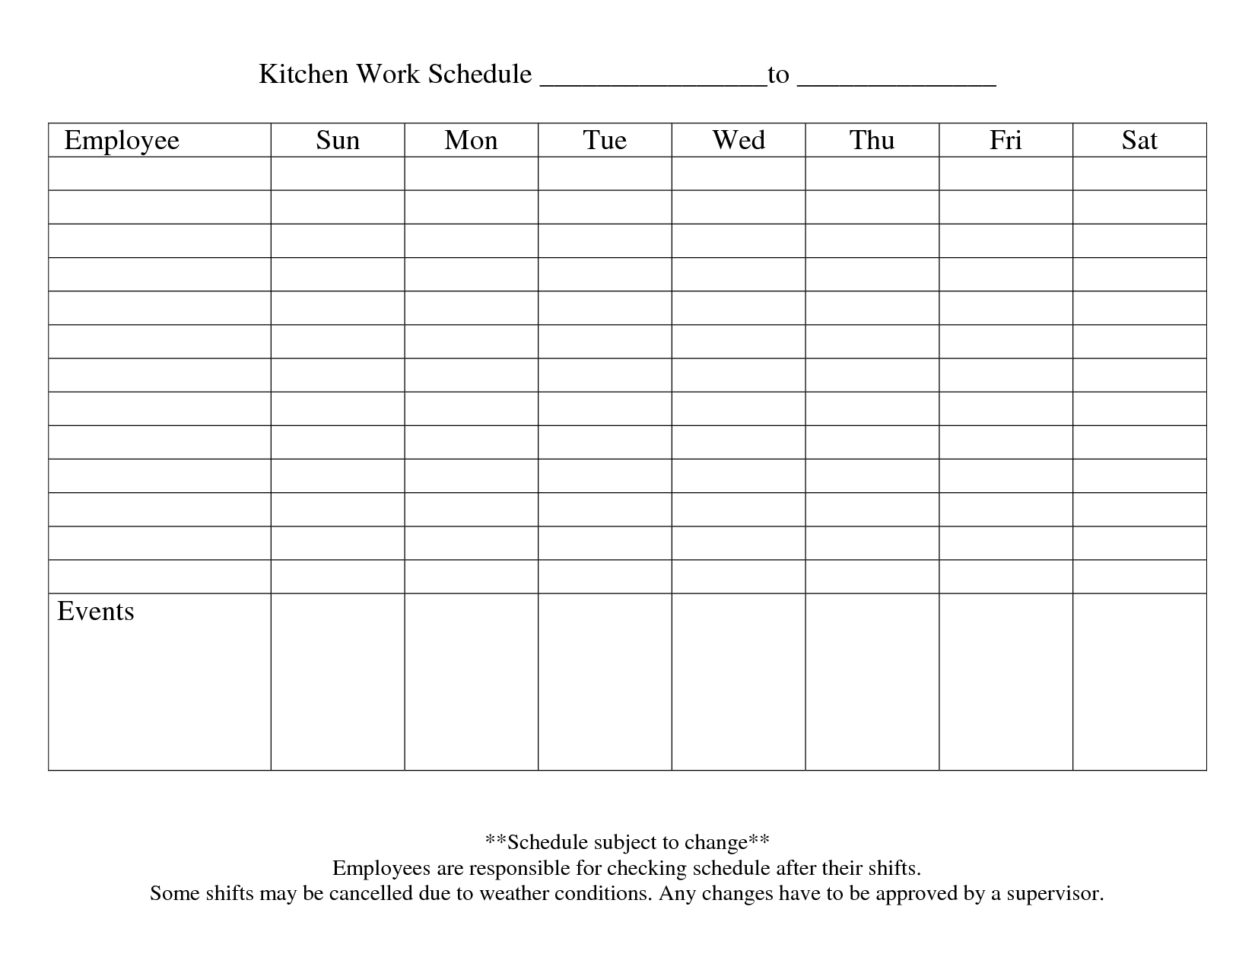 Fresh Weekly Schedule Template Printable | Aguakatedigital Templates For Printable Employee Schedule Templates